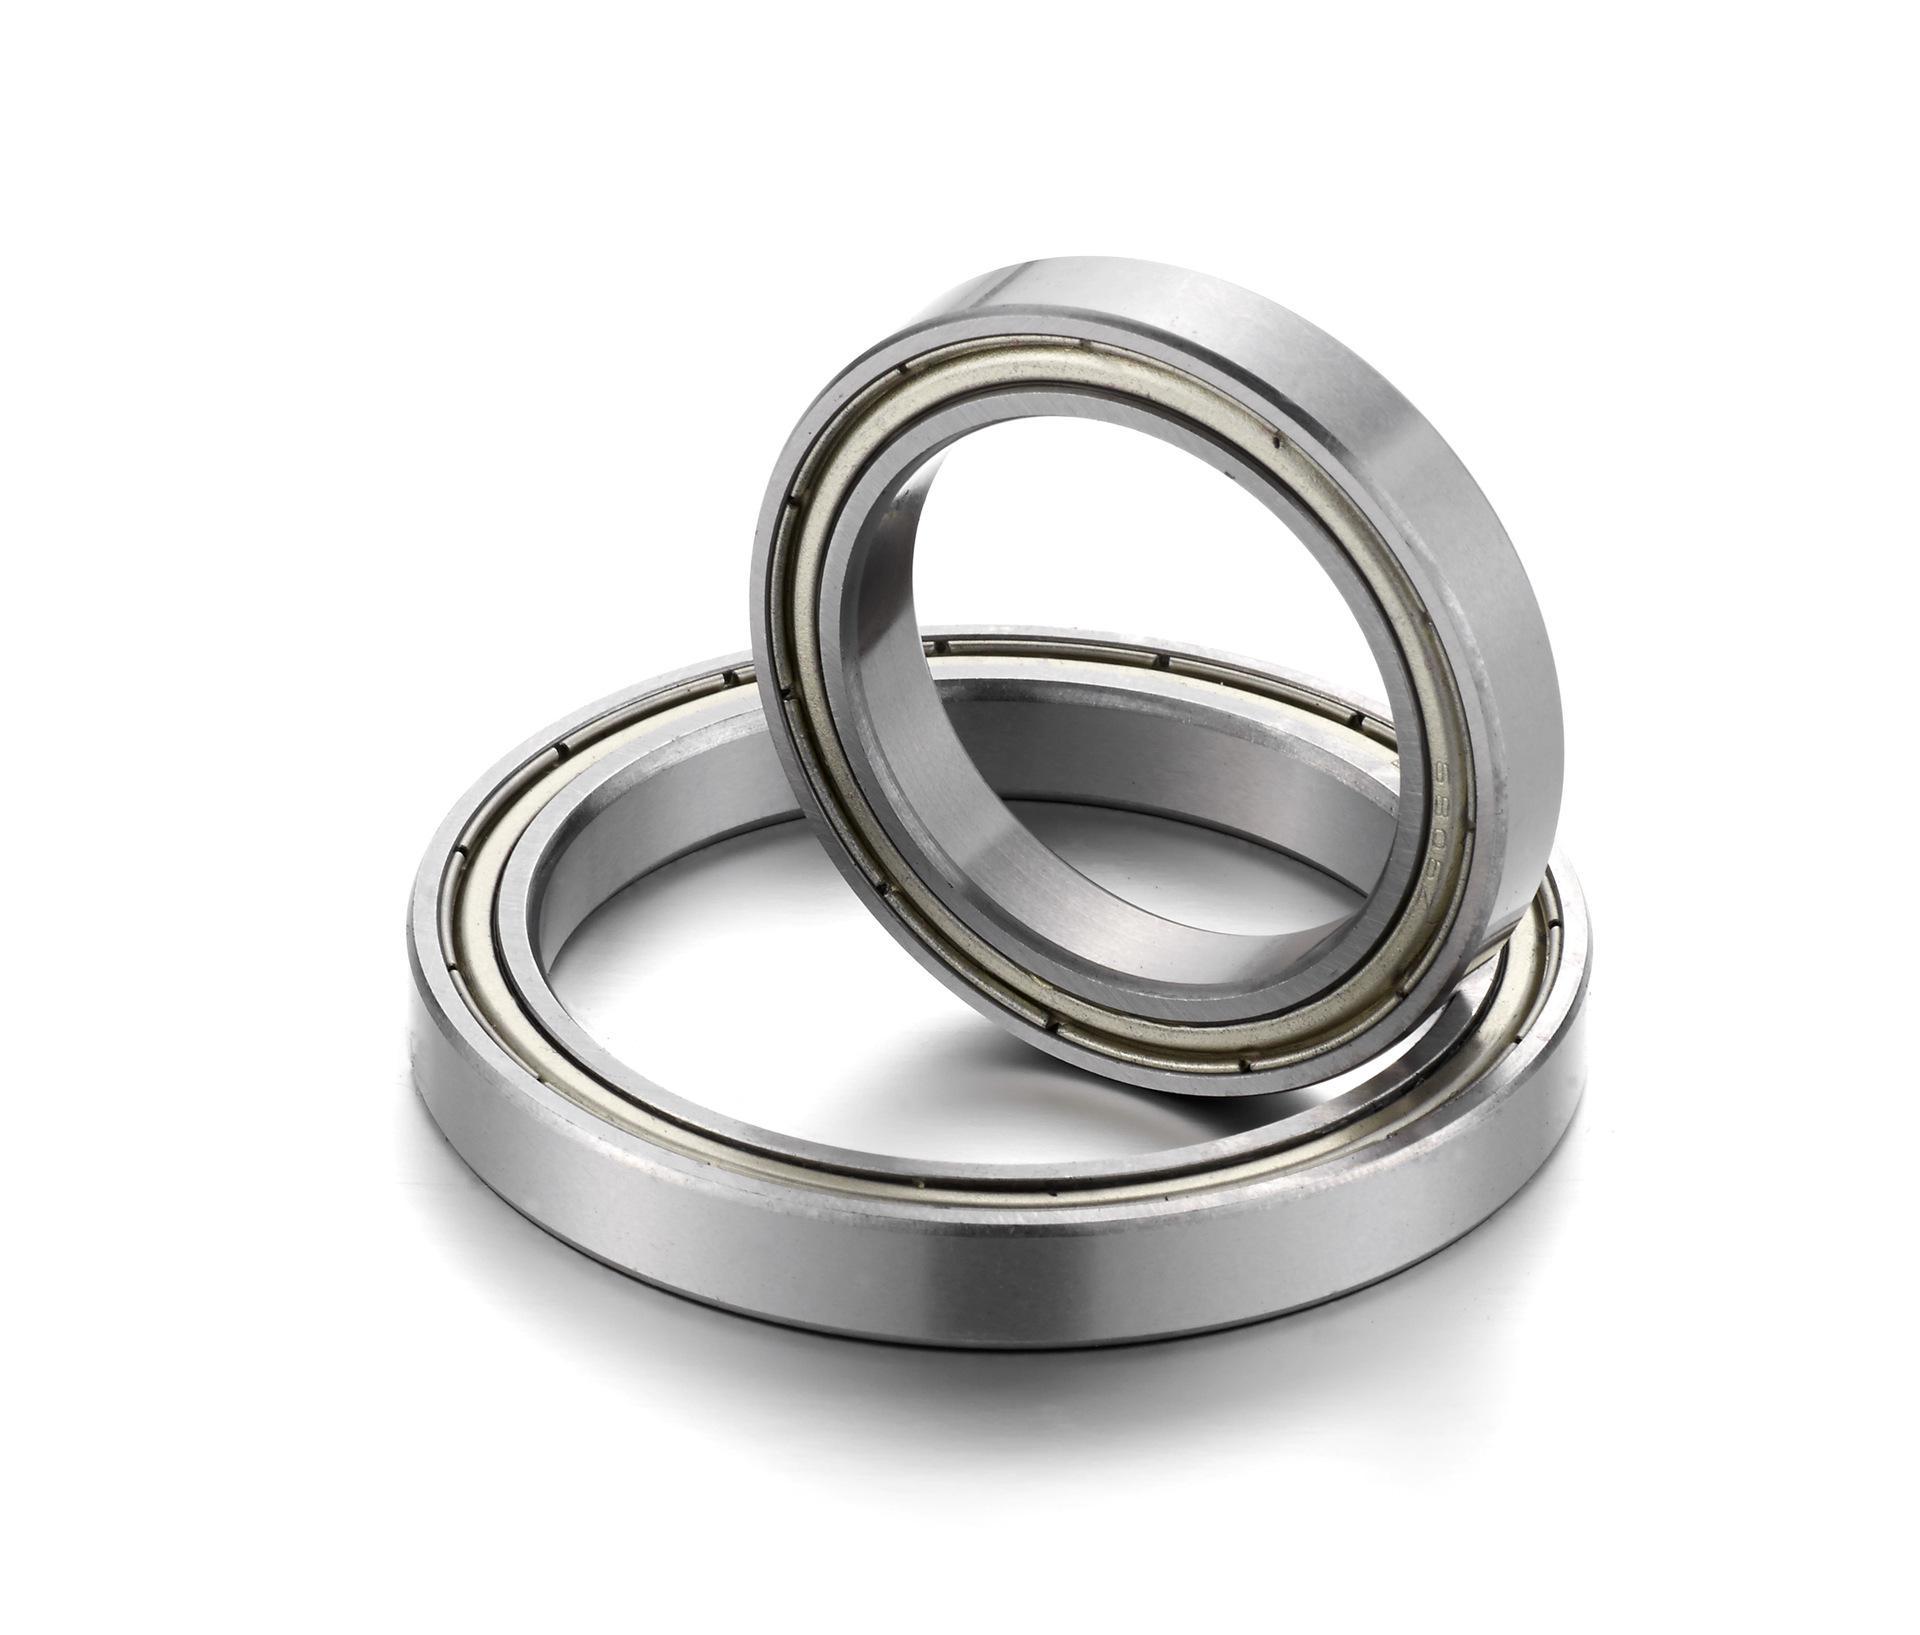 6912 ZZ ABEC-1 (2PCS) 60x85x13 Metric Thin Section Bearings 61912Z 6912ZZ 1pcs 71901 71901cd p4 7901 12x24x6 mochu thin walled miniature angular contact bearings speed spindle bearings cnc abec 7